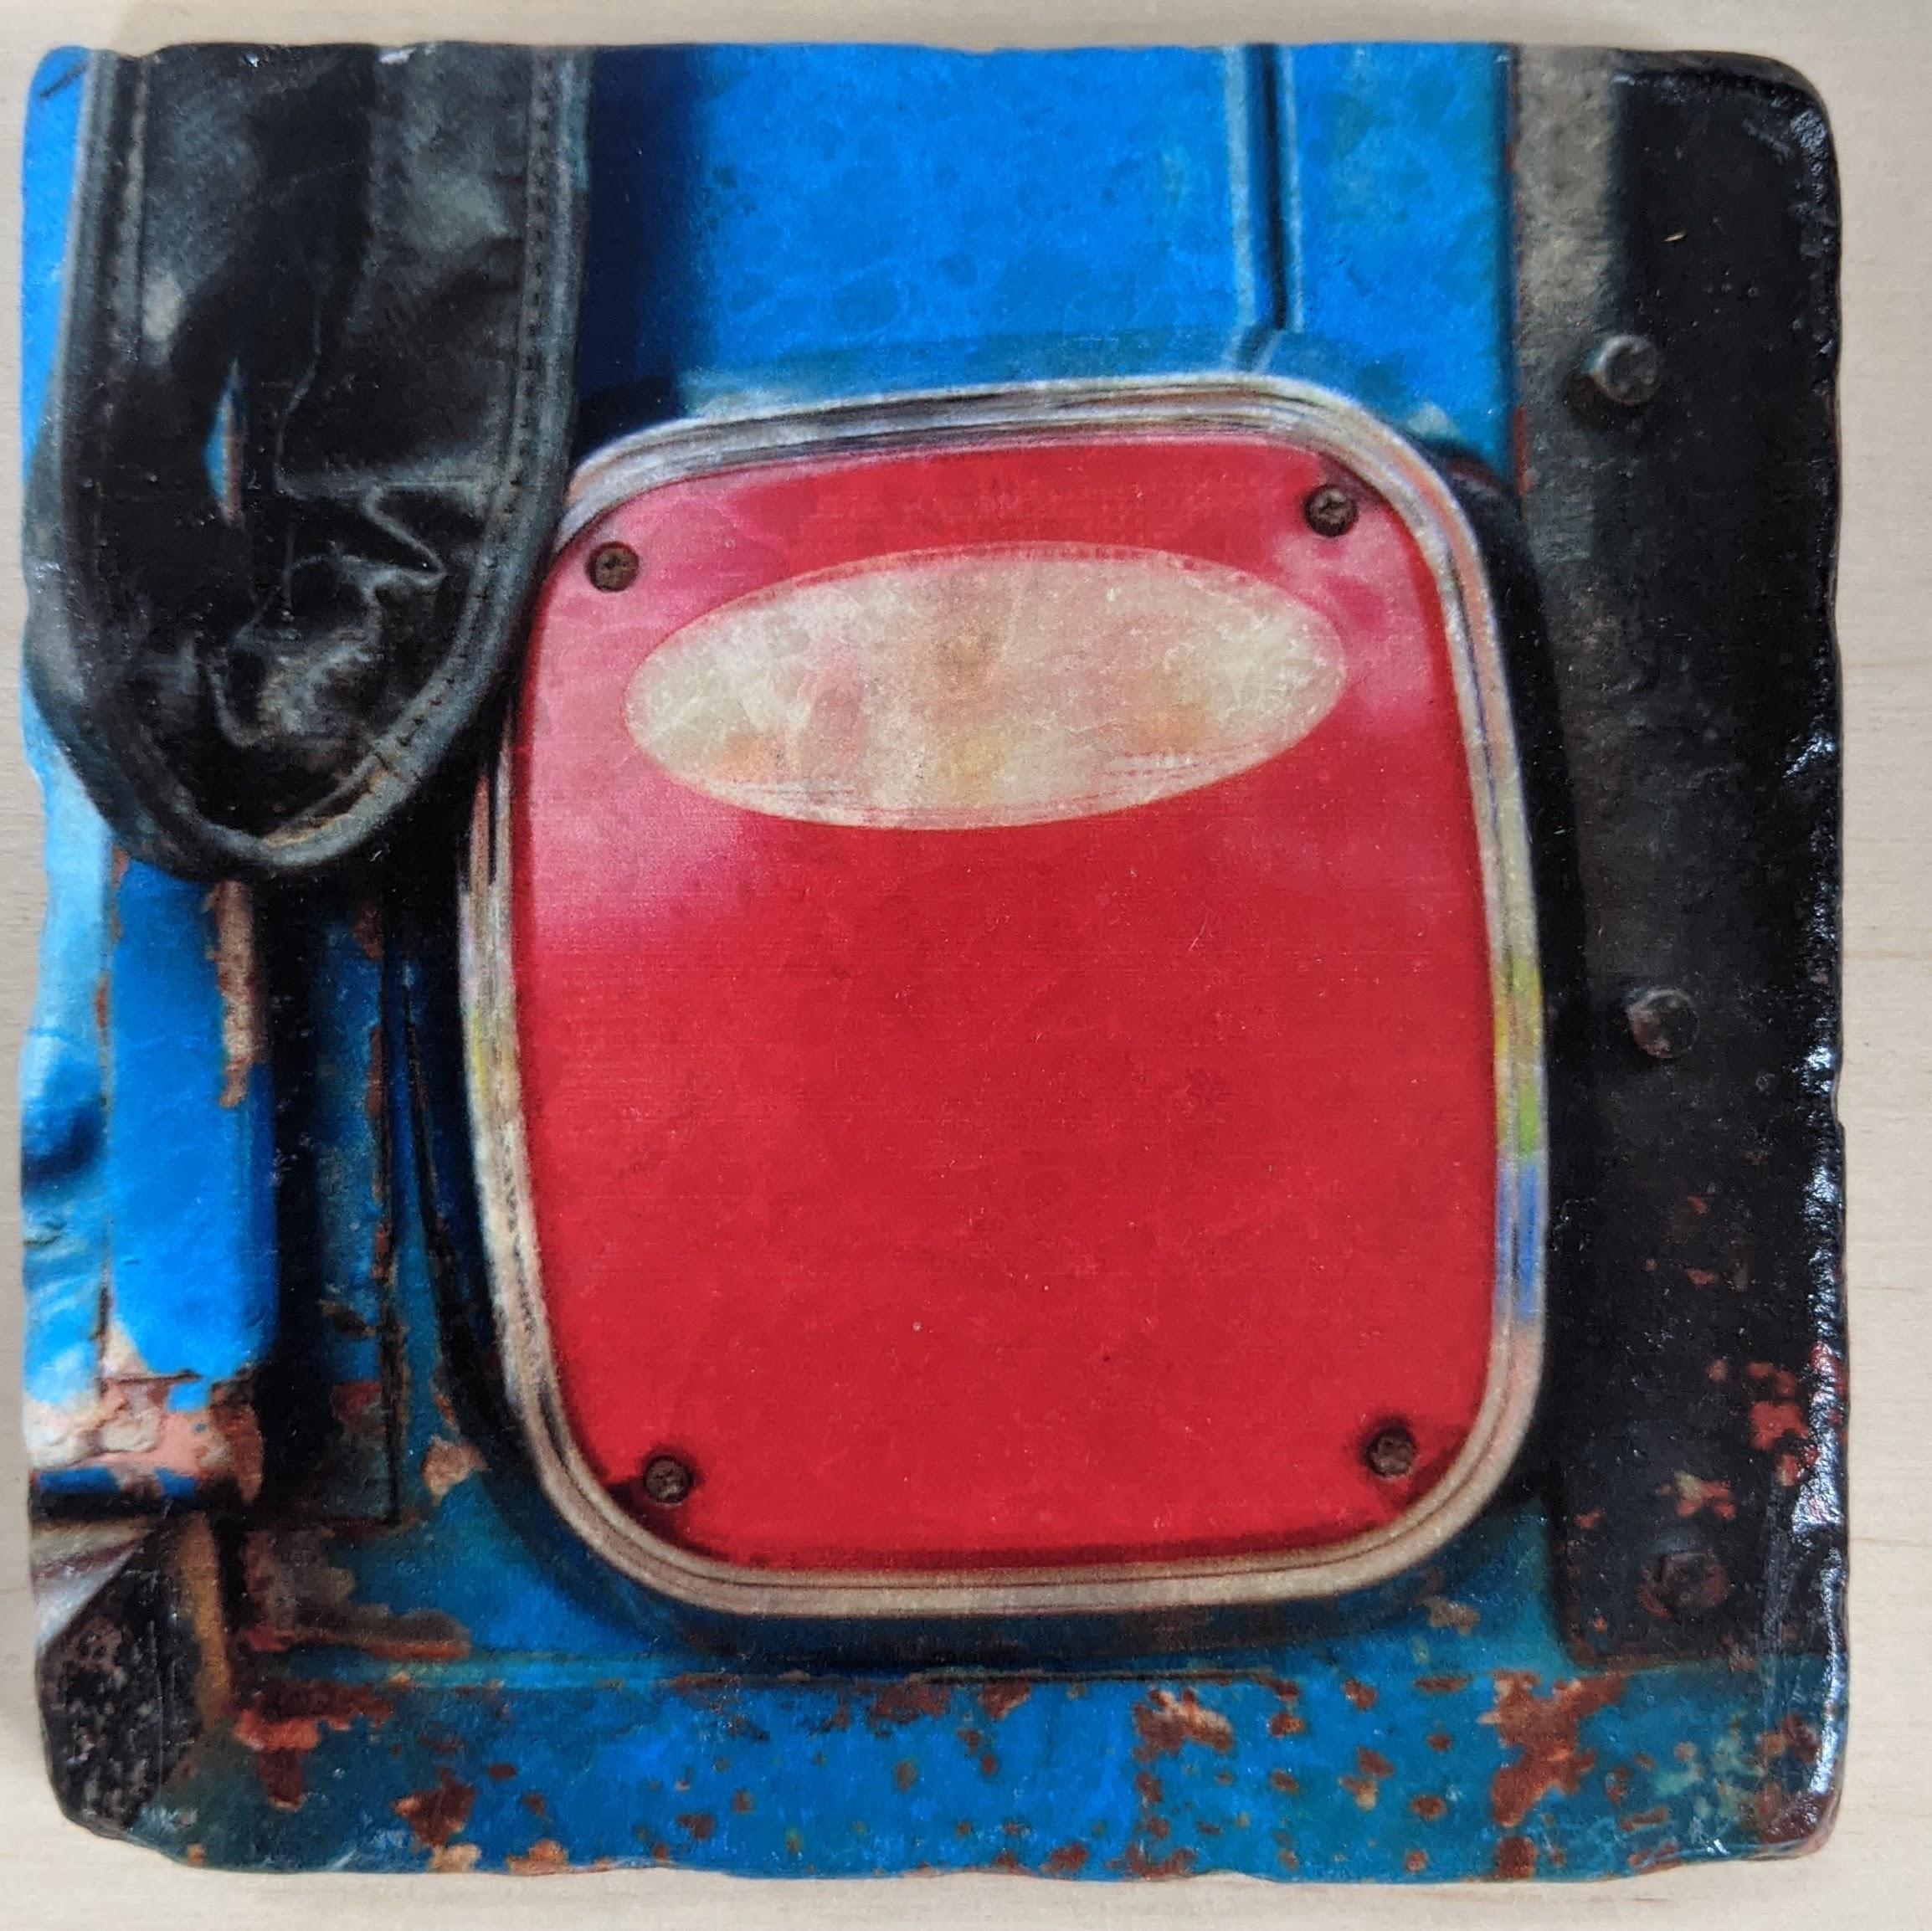 Jeep - Marble Art Coaster-03